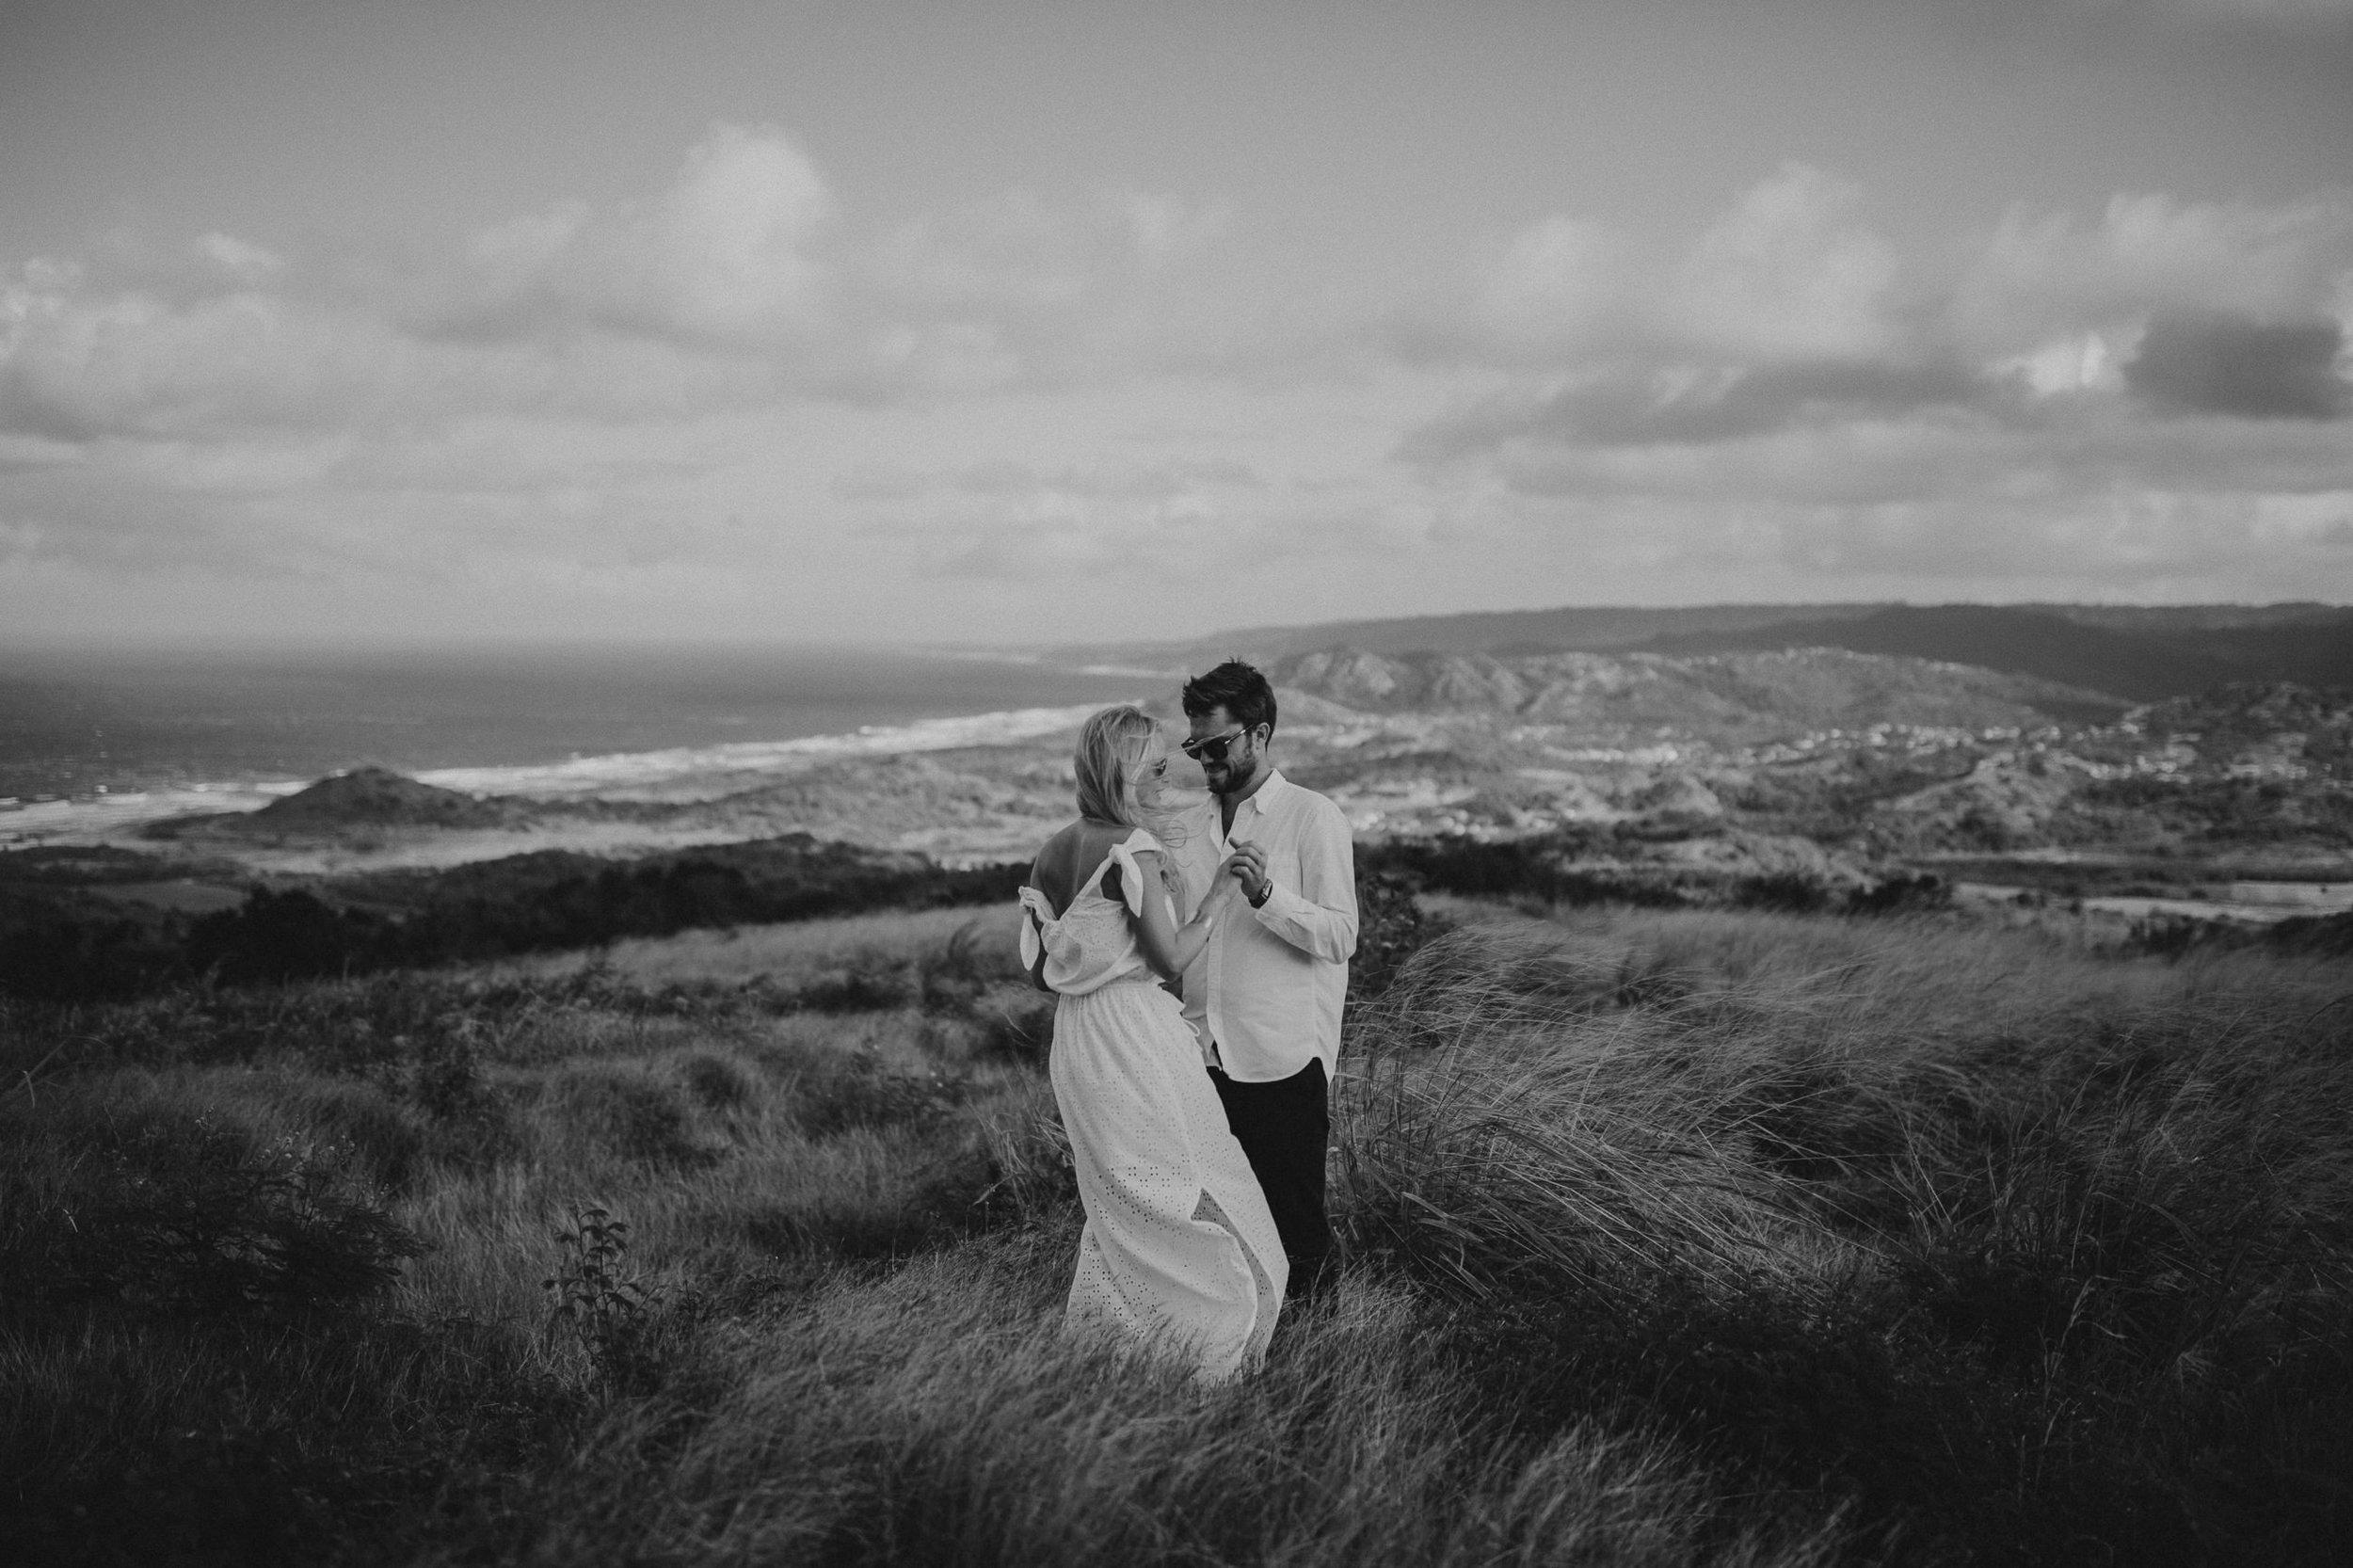 barbados_wedding_portrait_photographer_21.jpg